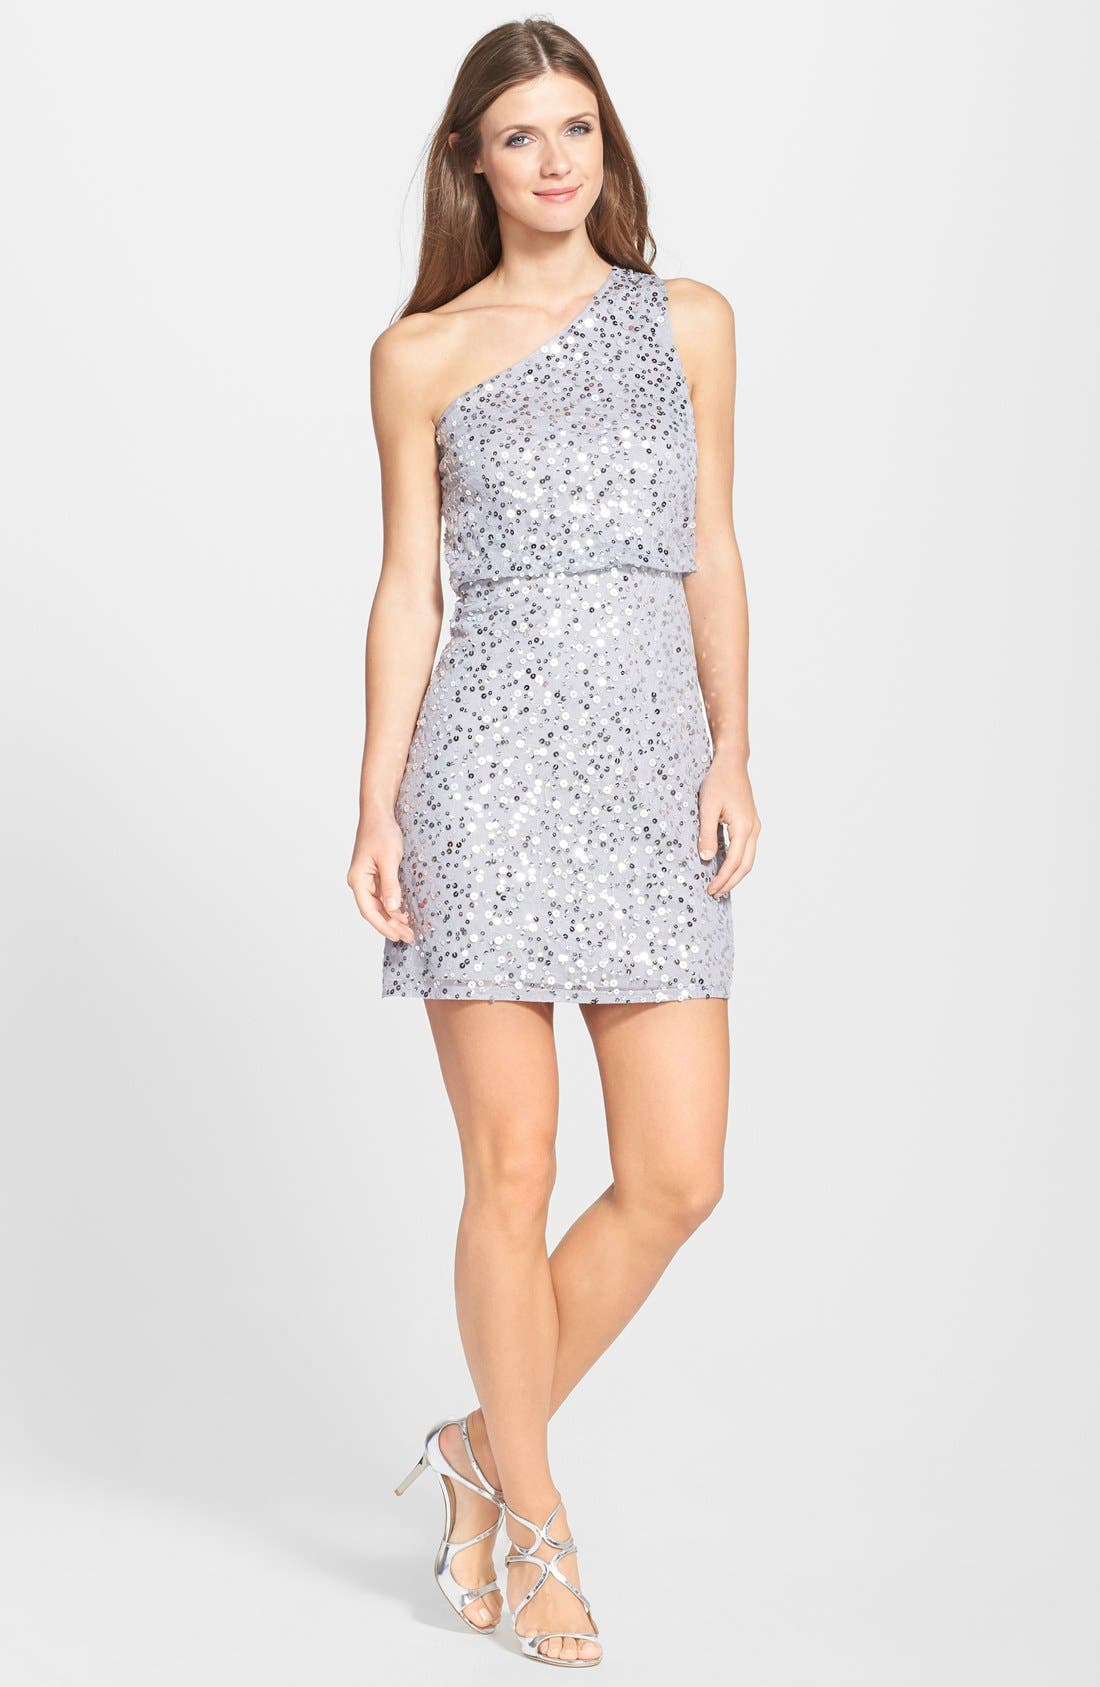 Alternate Image 1 Selected - JS Boutique One Shoulder Sequin Blouson Dress